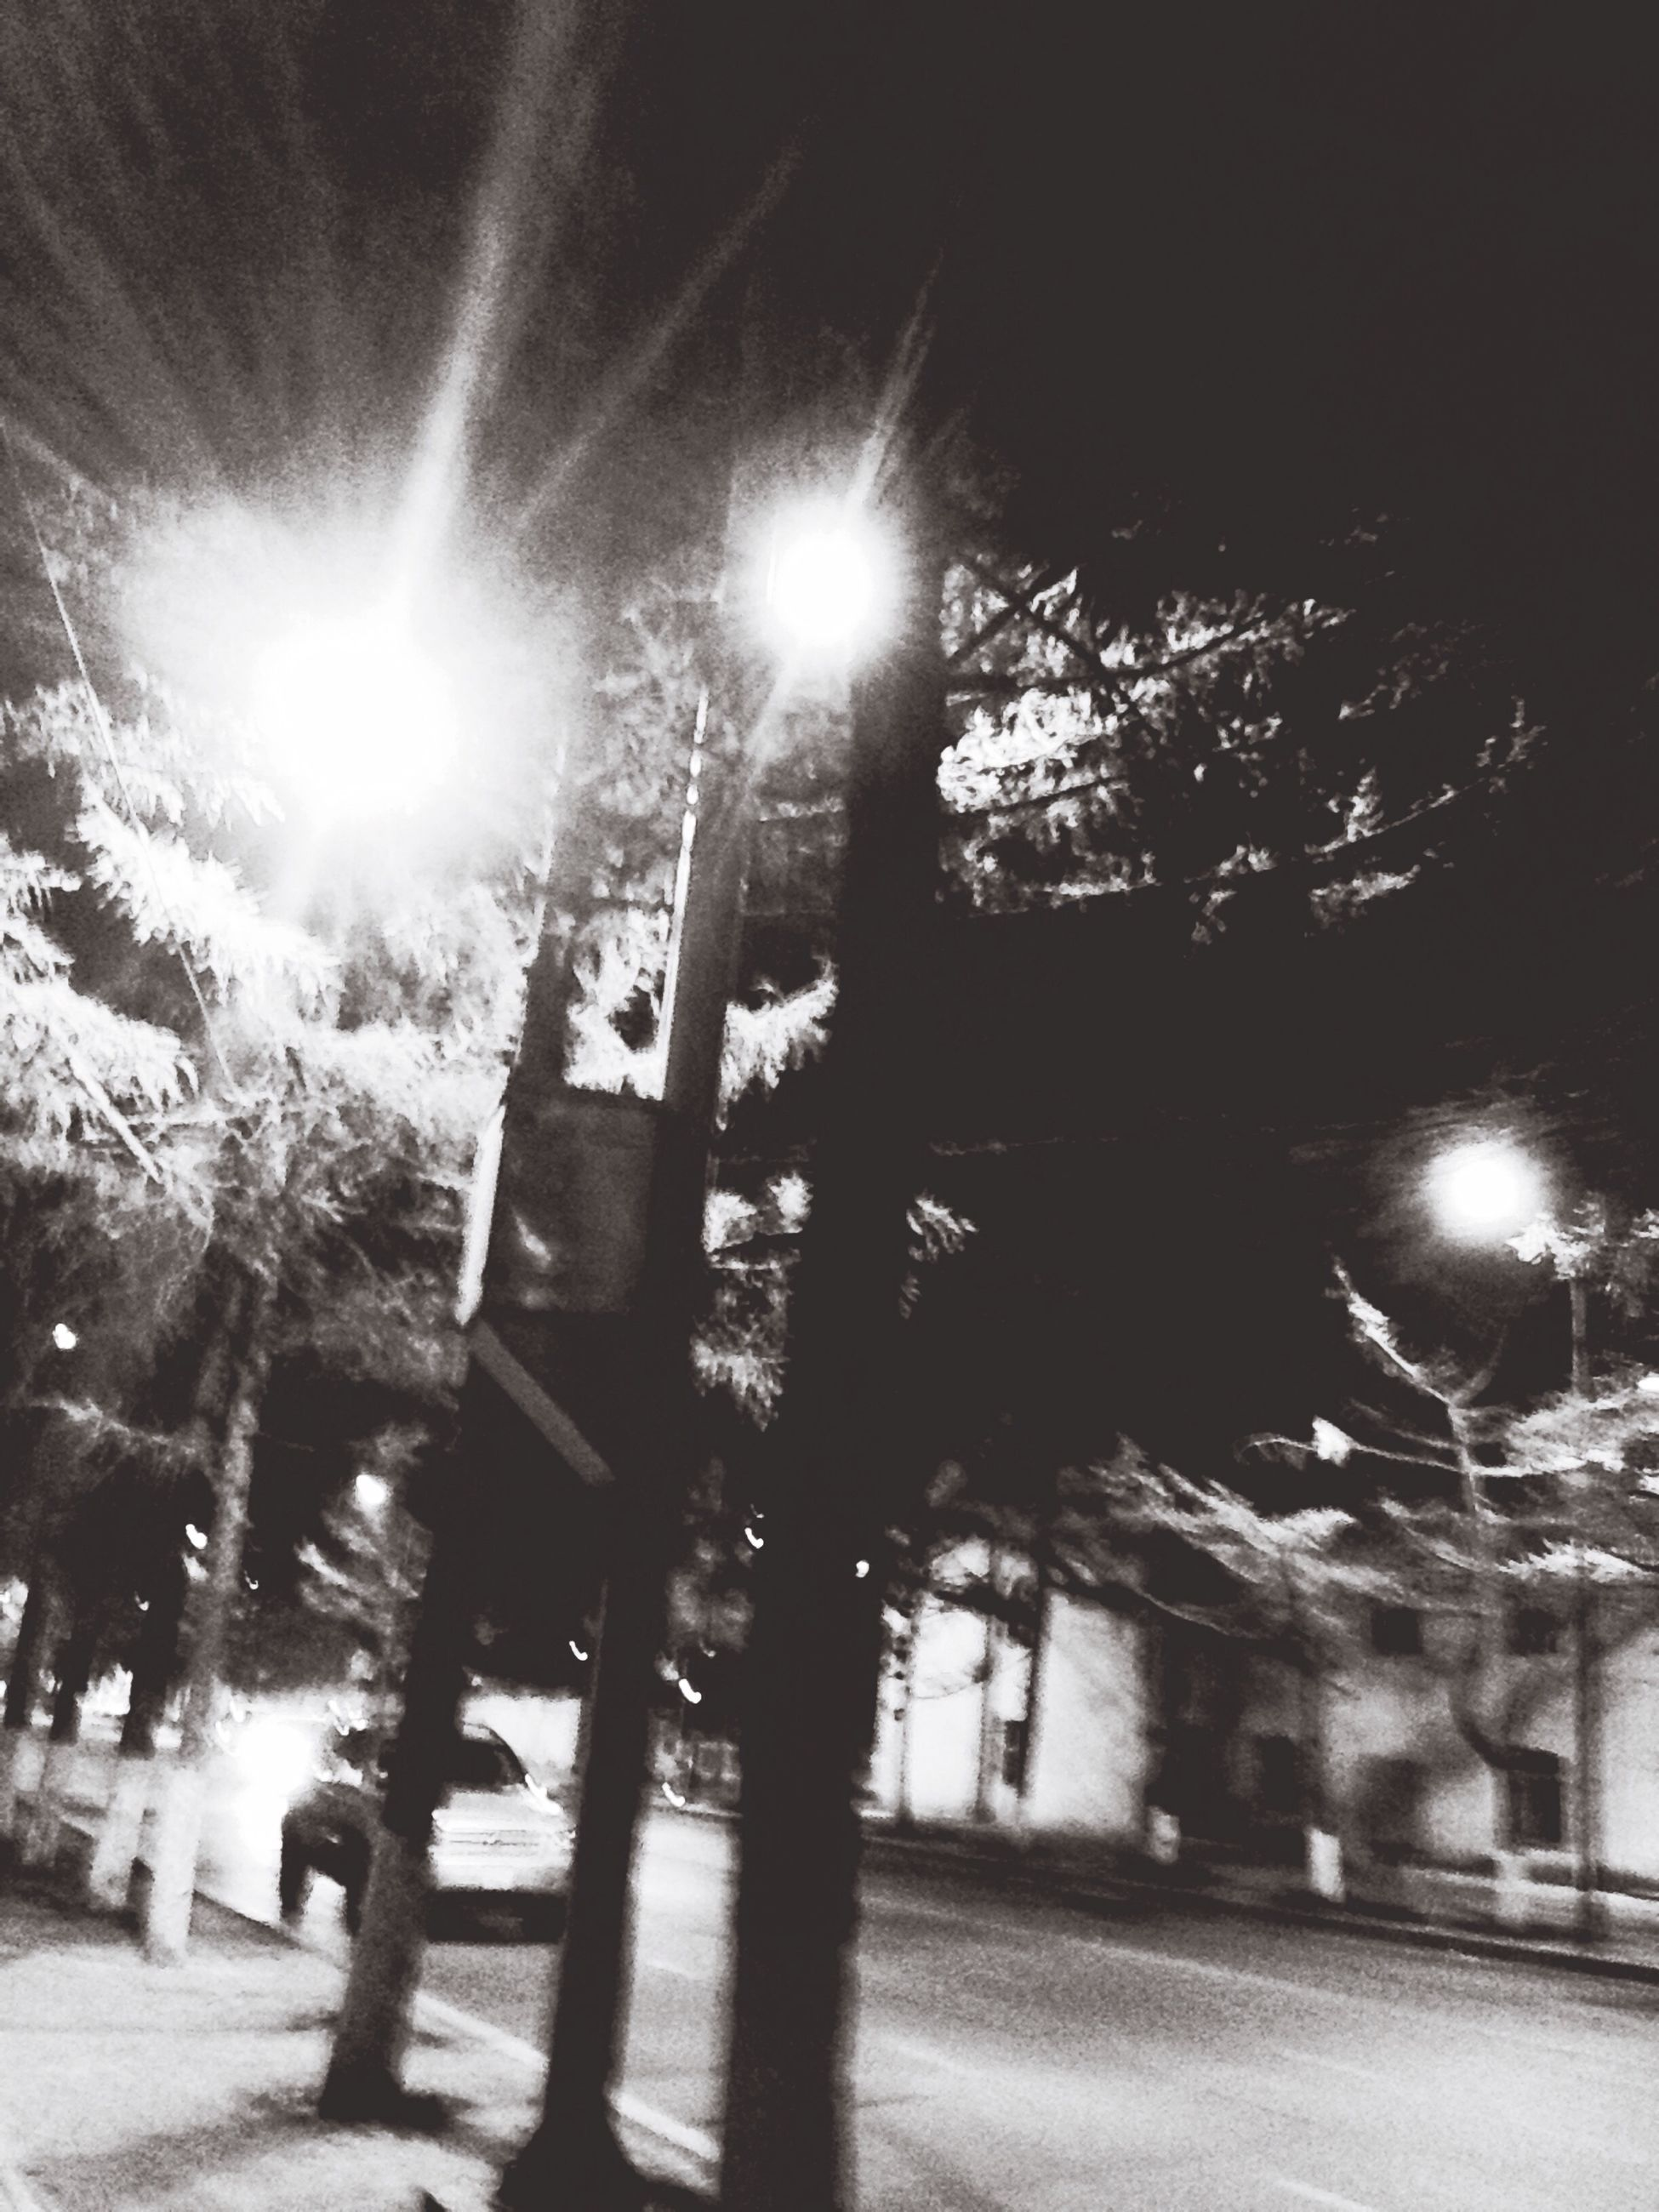 building exterior, architecture, built structure, tree, lens flare, sunlight, sun, sunbeam, illuminated, night, low angle view, street light, lighting equipment, city, outdoors, building, shadow, sunny, sky, street